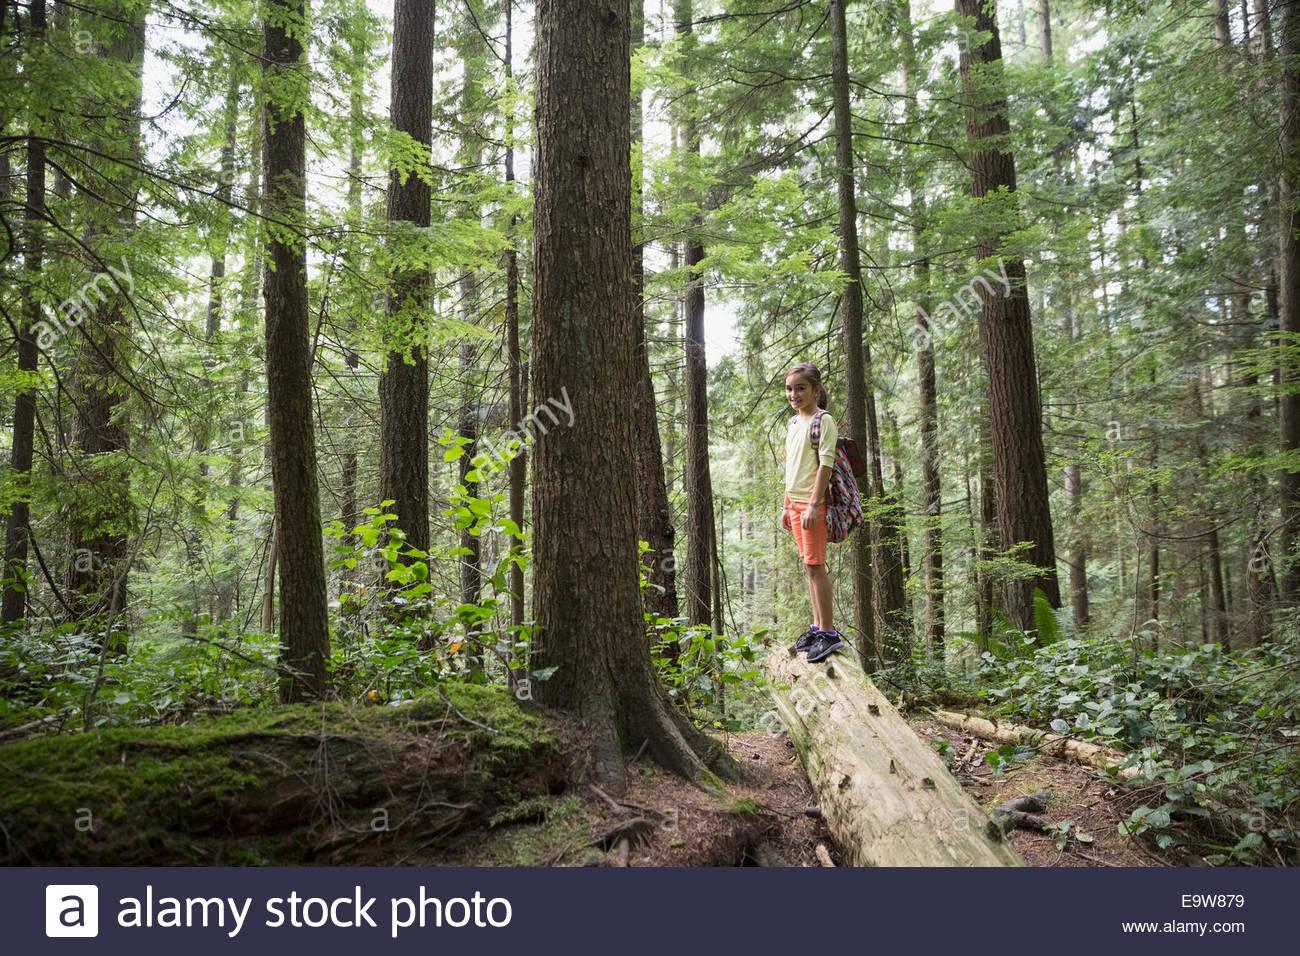 Portrait of girl on fallen tree in woods - Stock Image